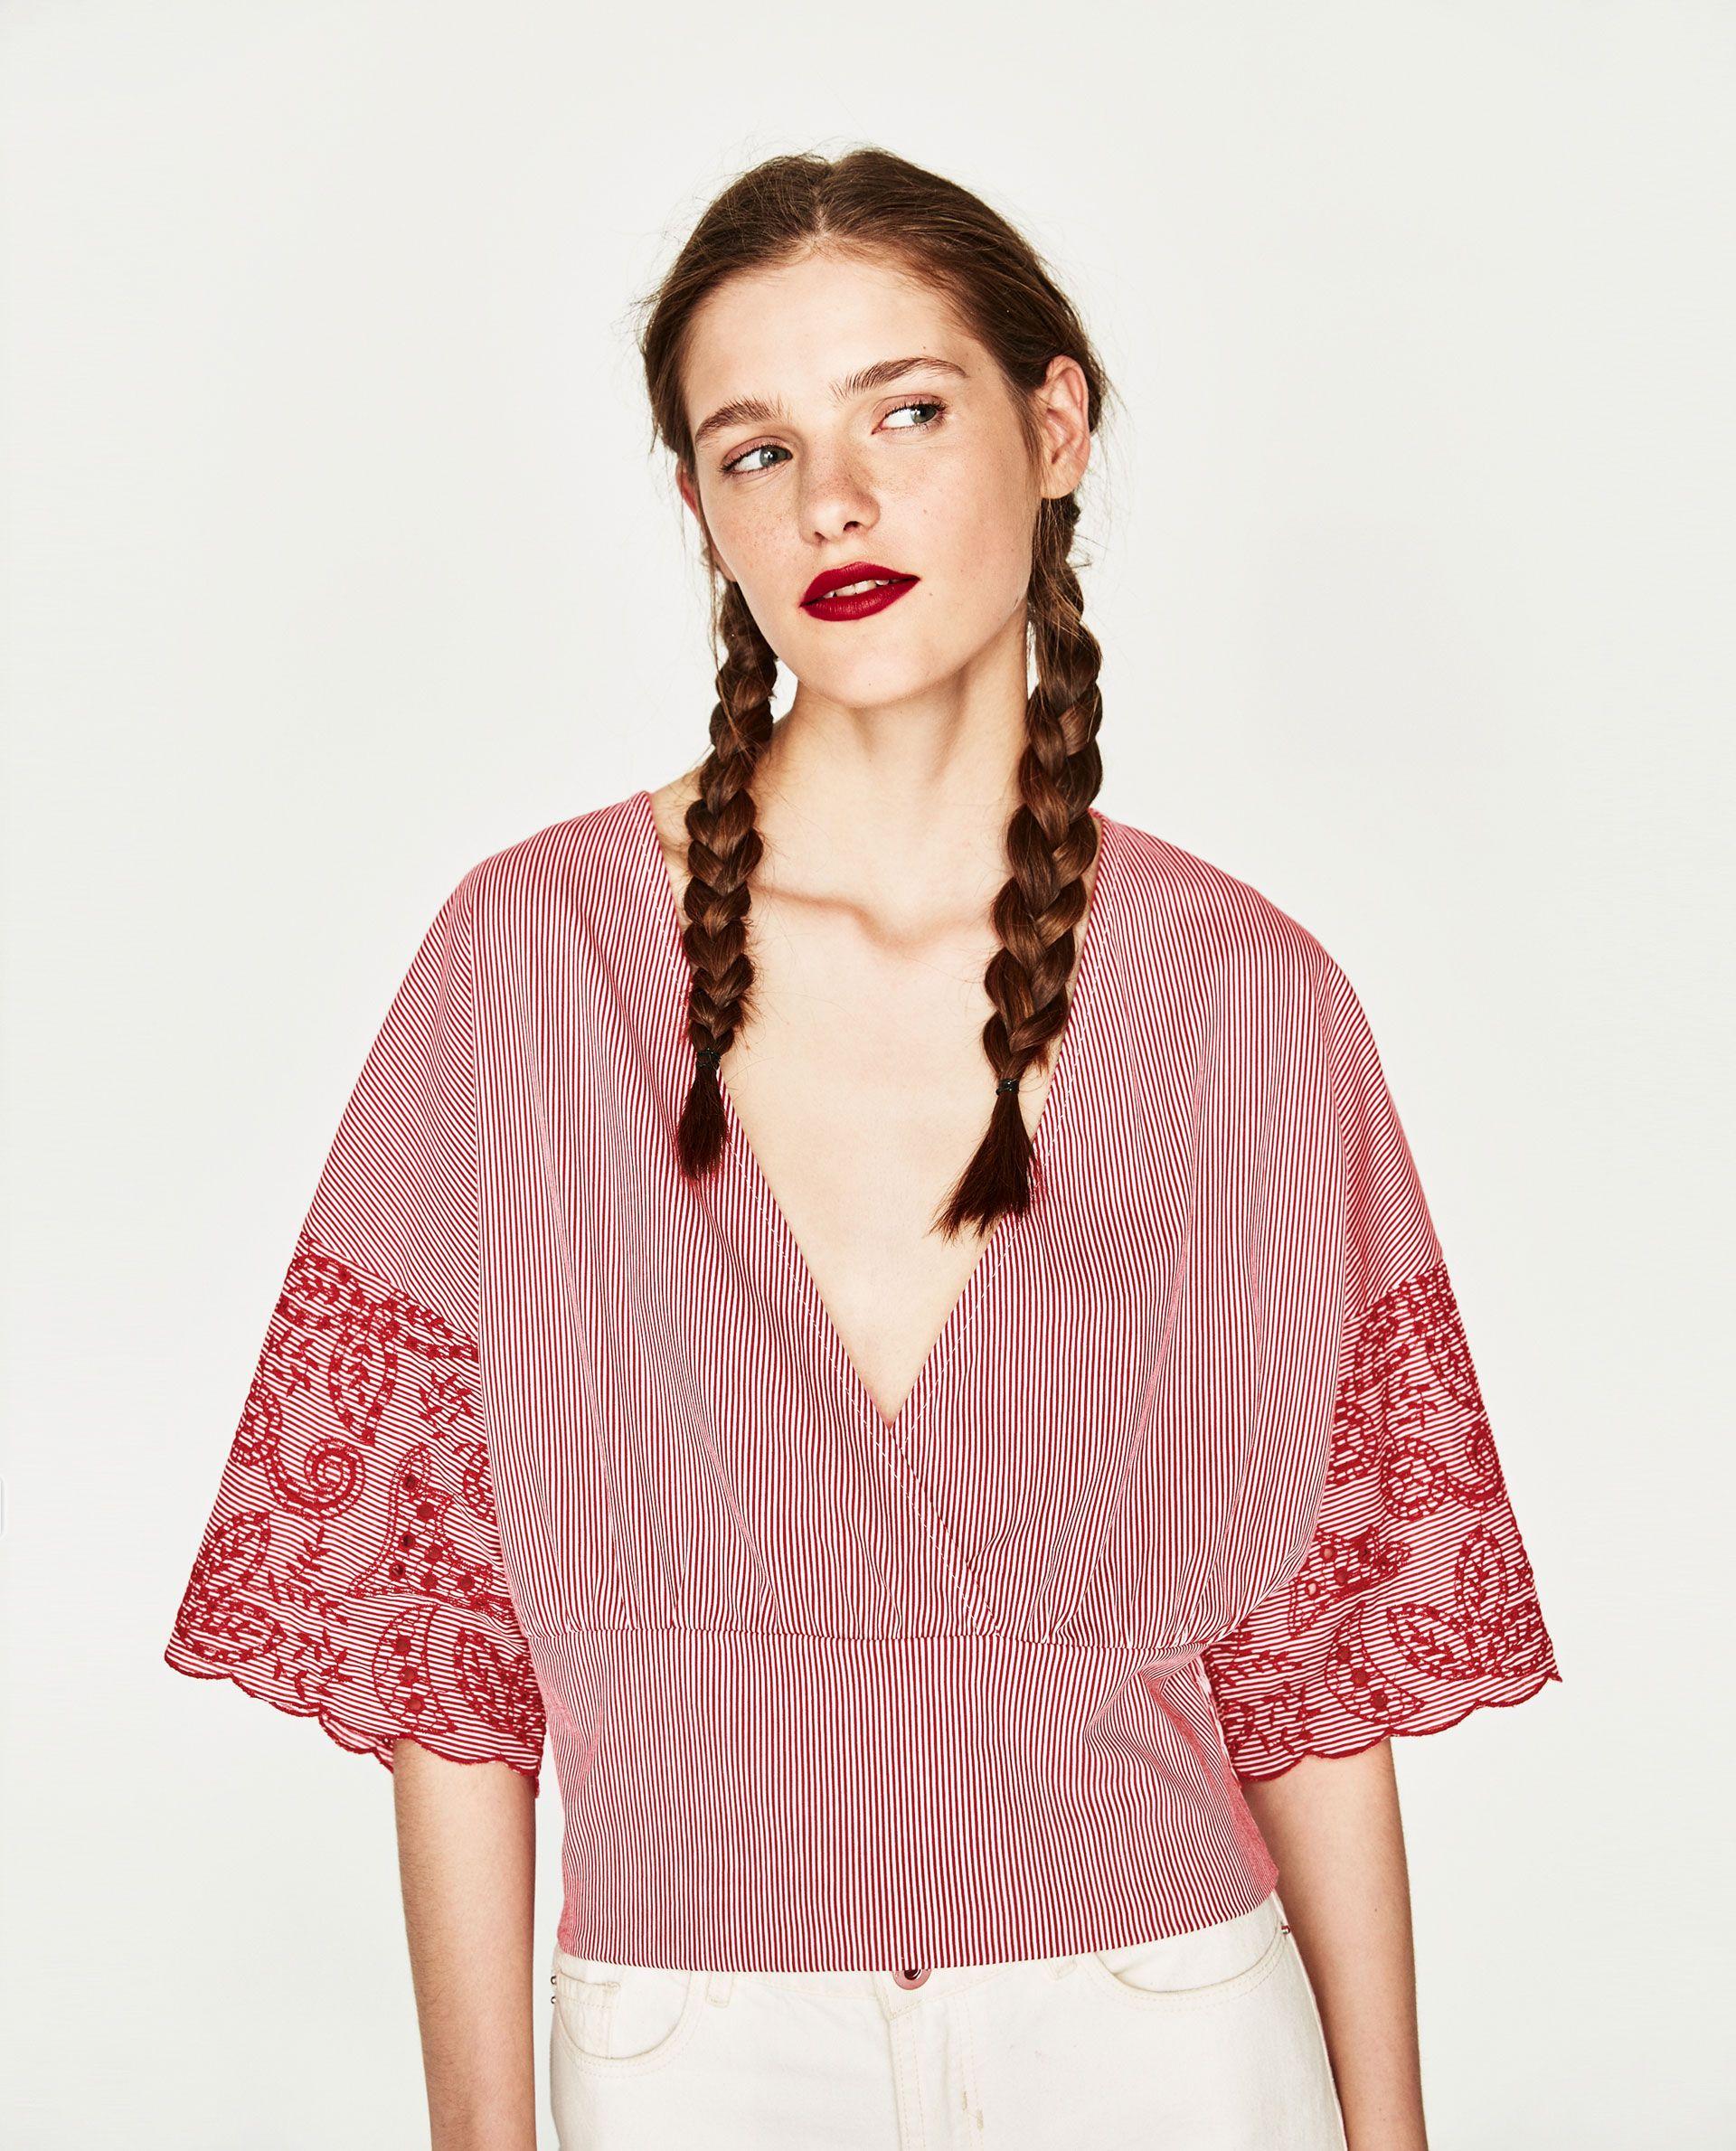 ed45fb9283e ZARA RED EMBROIDERED STRIPED TOP   Zara   Zara embroidered top, Tops